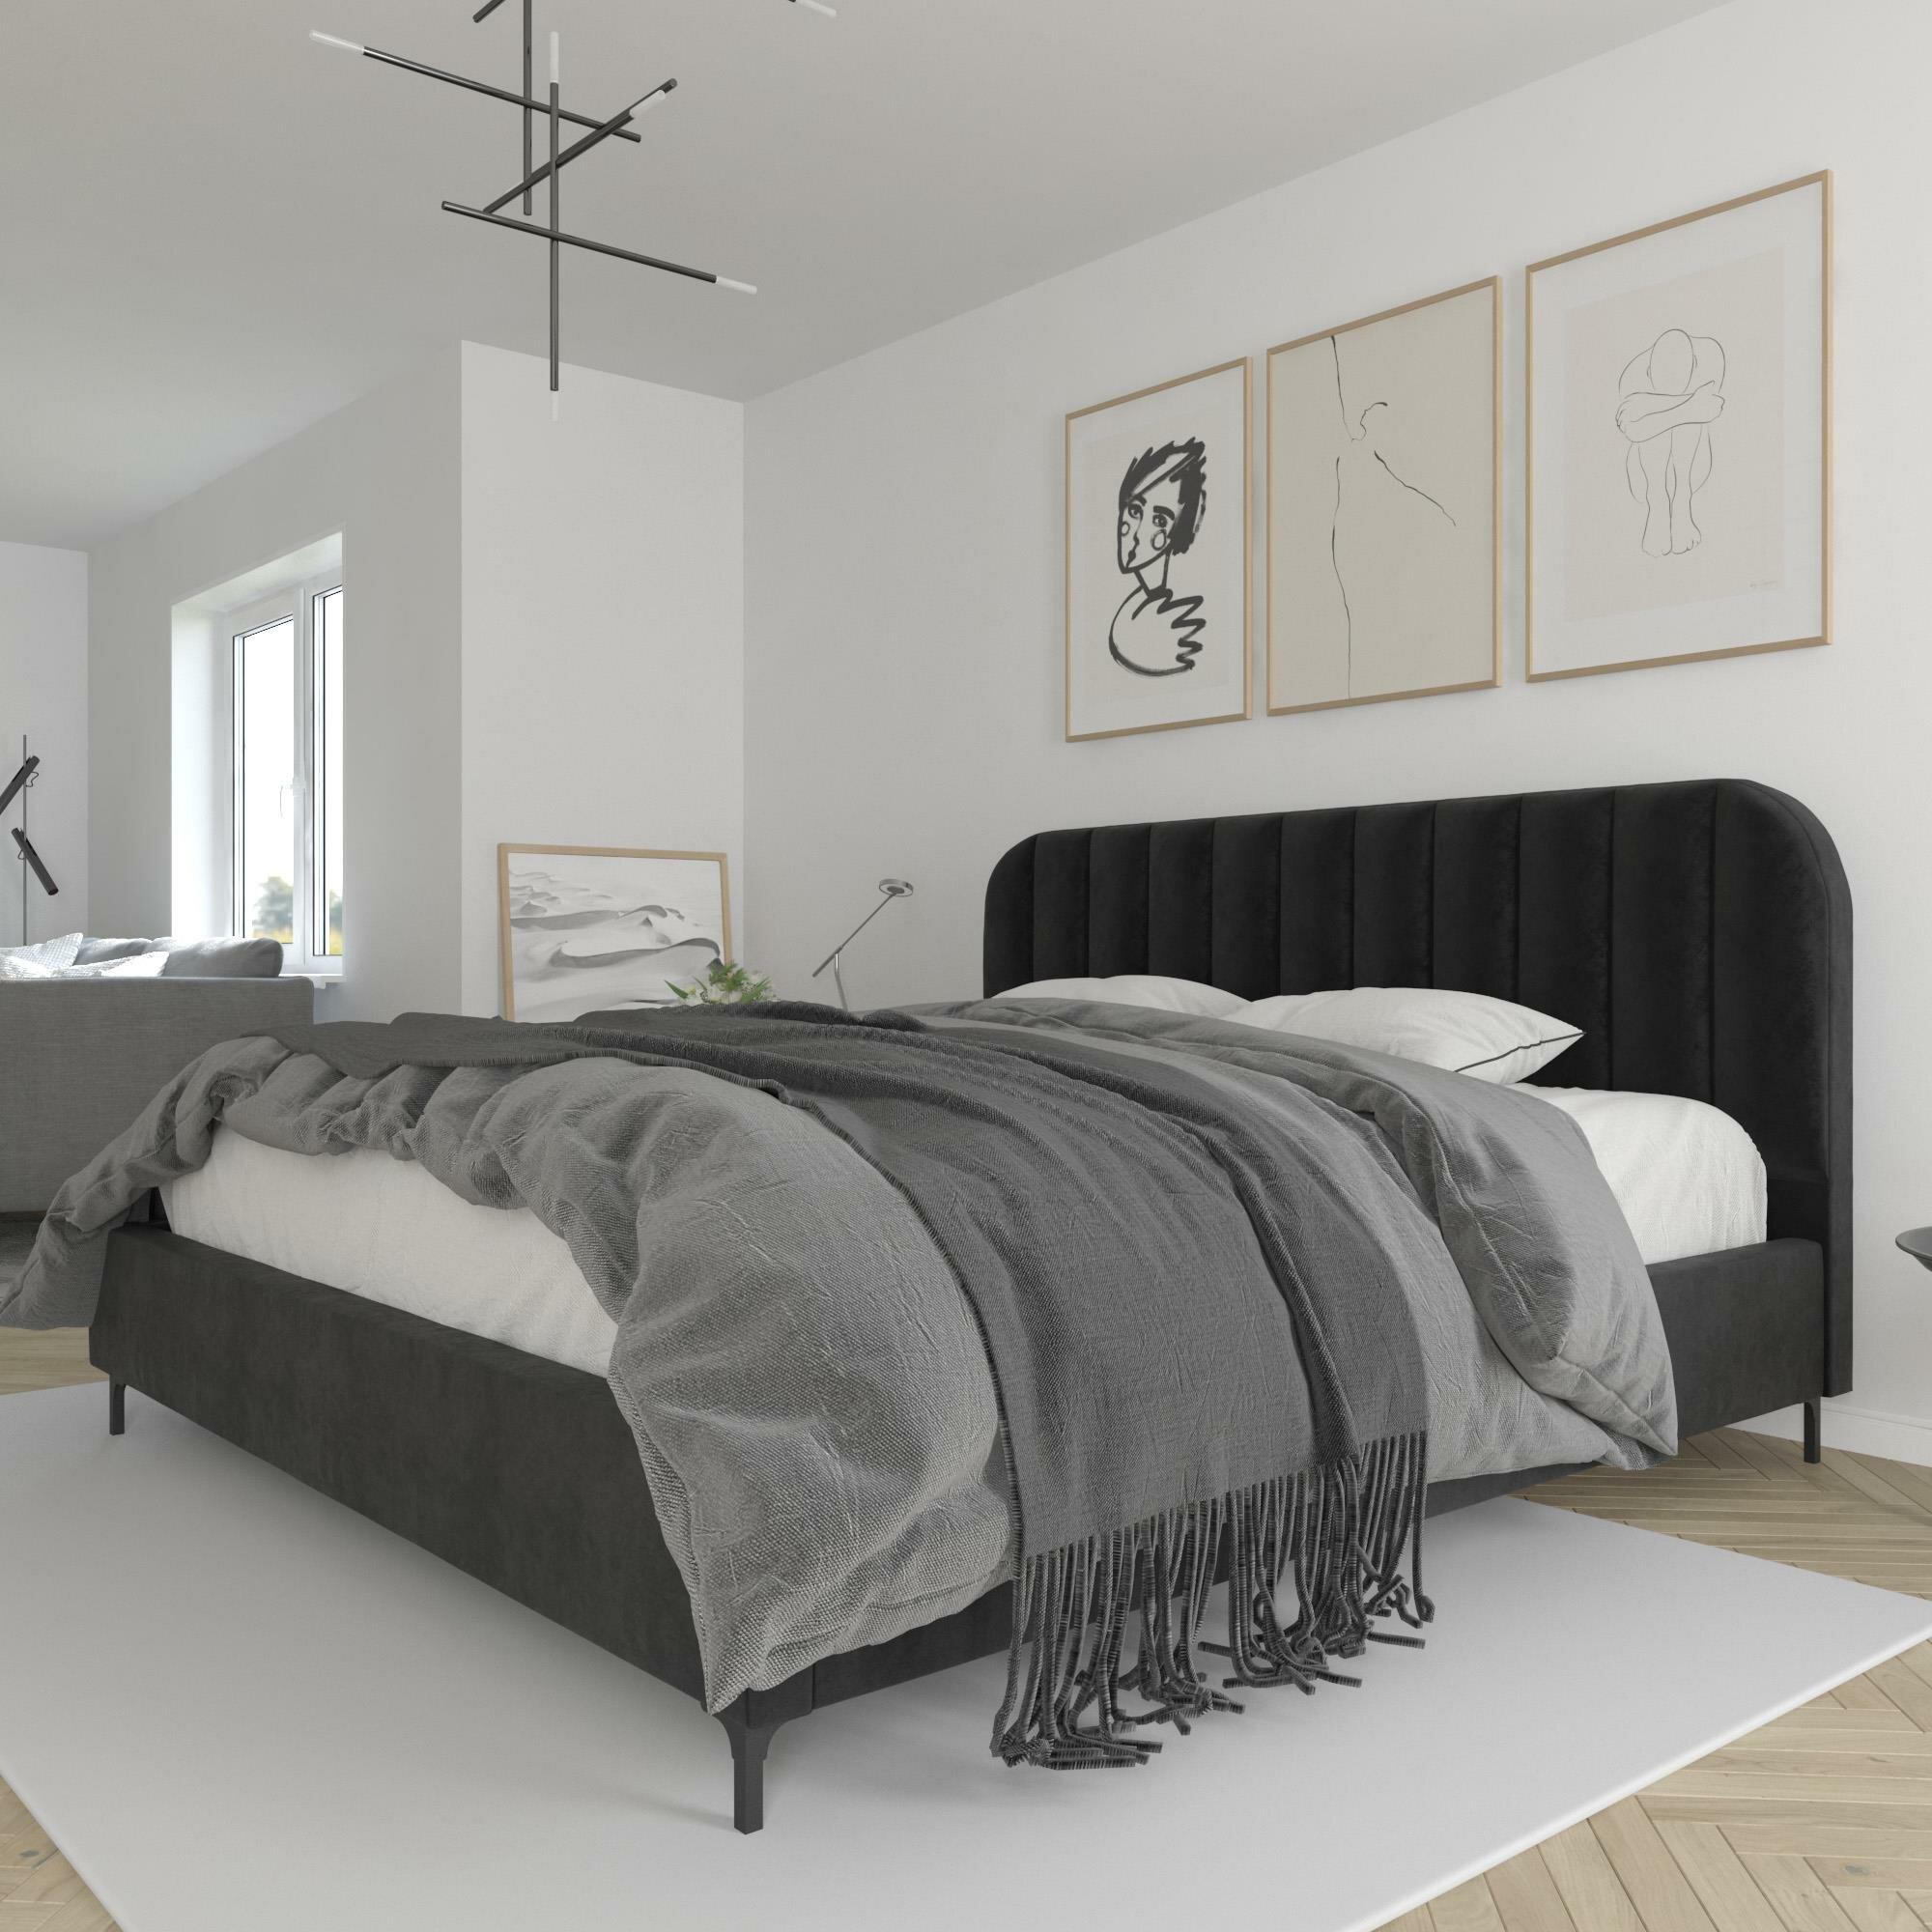 Mercer41 Perrine Upholstered Low Profile Platform Bed Reviews Wayfair Ca